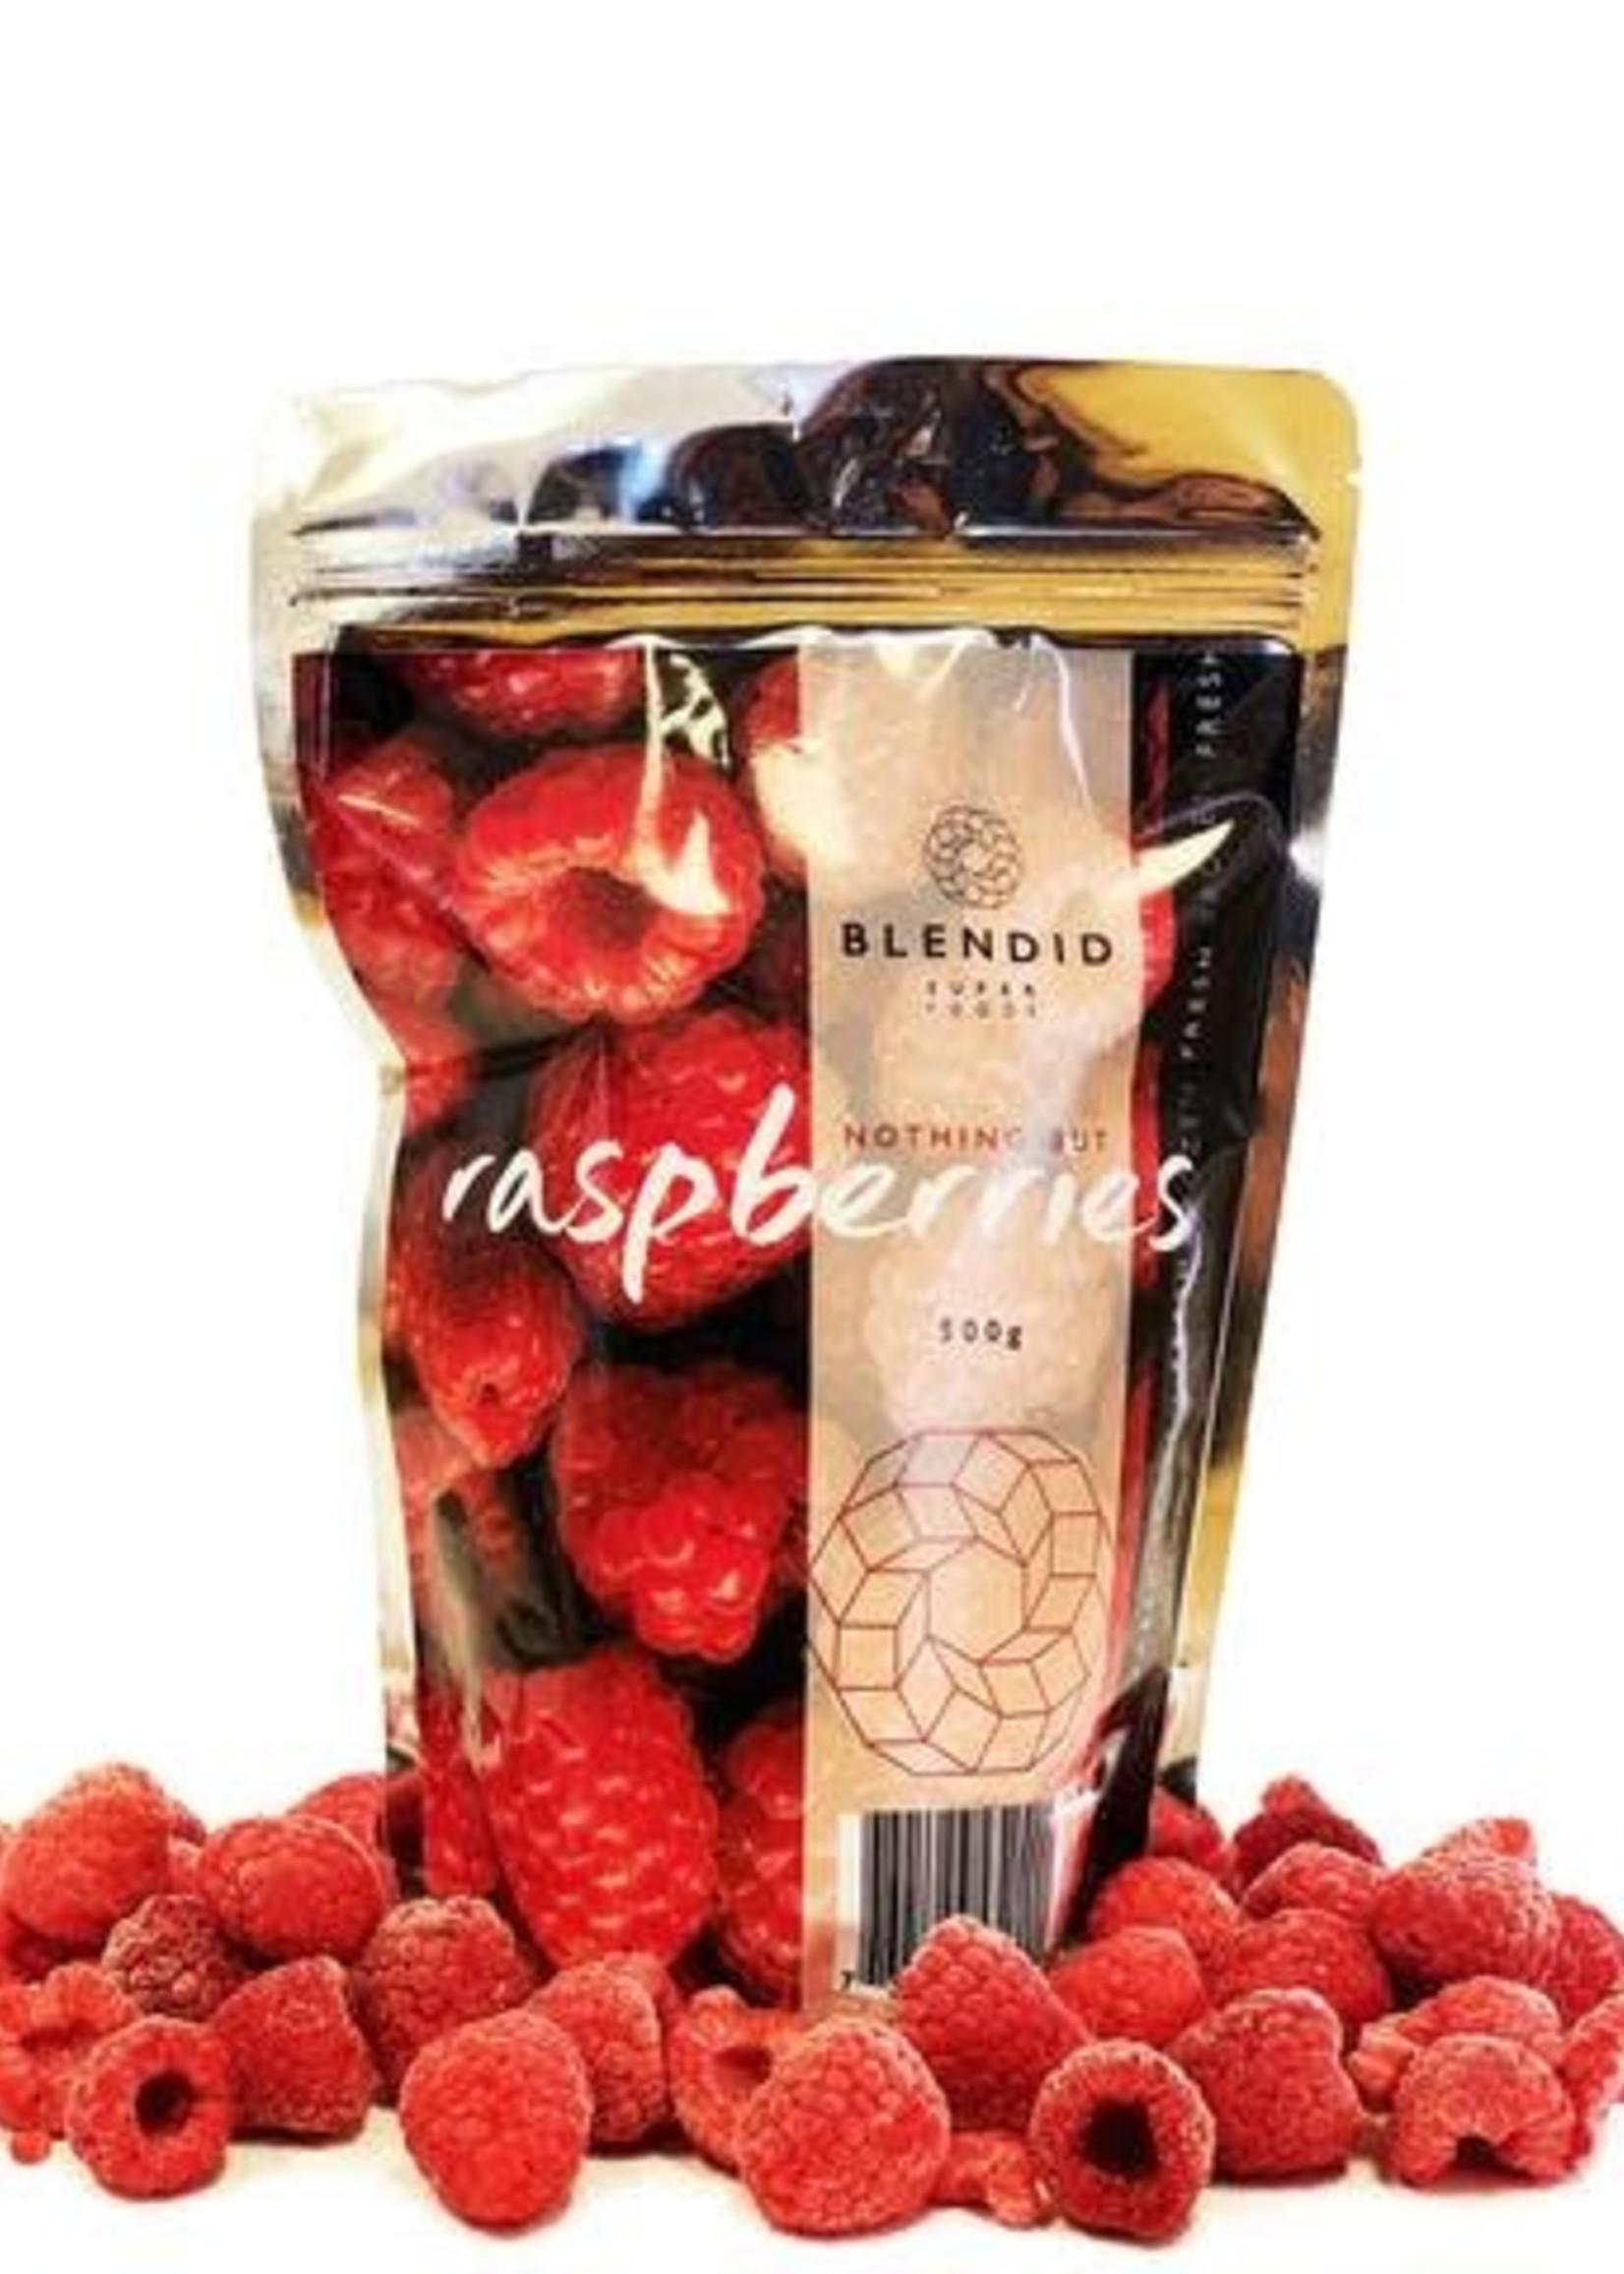 Blendid Blendid - Frozen raspberries